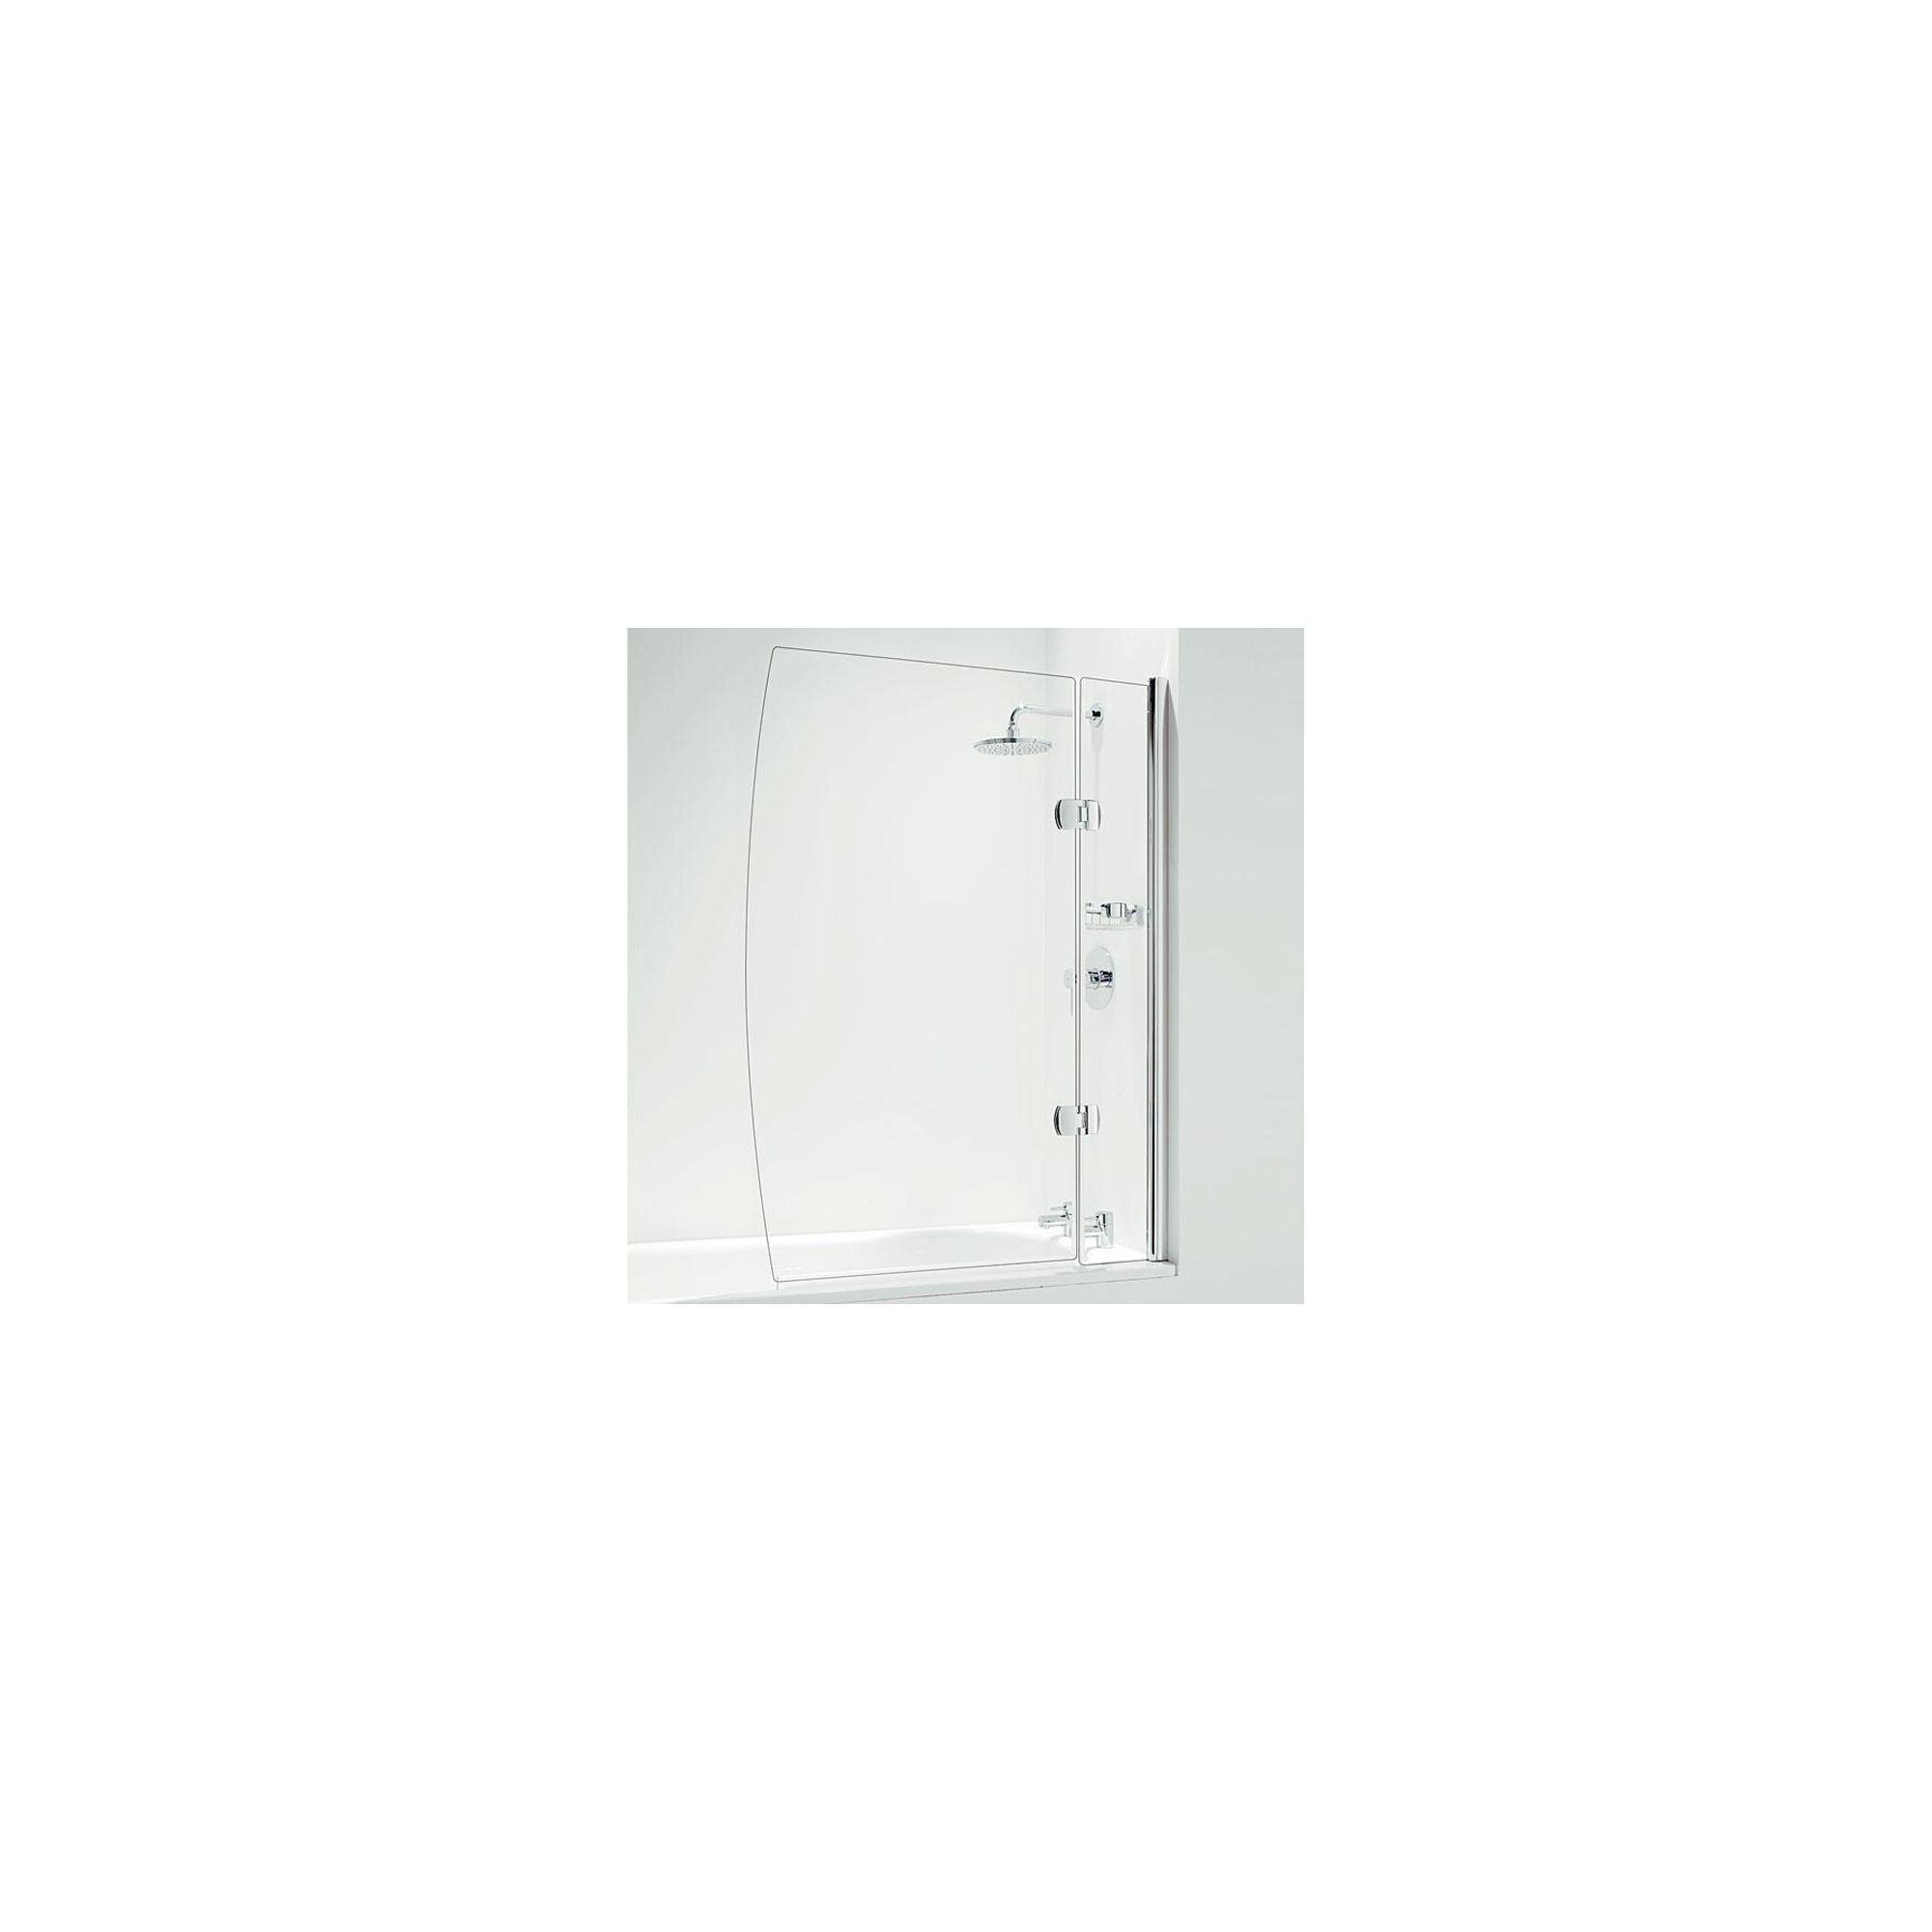 Coram Designer Hinged D Shape Bath Screen 1400mm High x 1050mm Wide - 5mm Glass at Tesco Direct